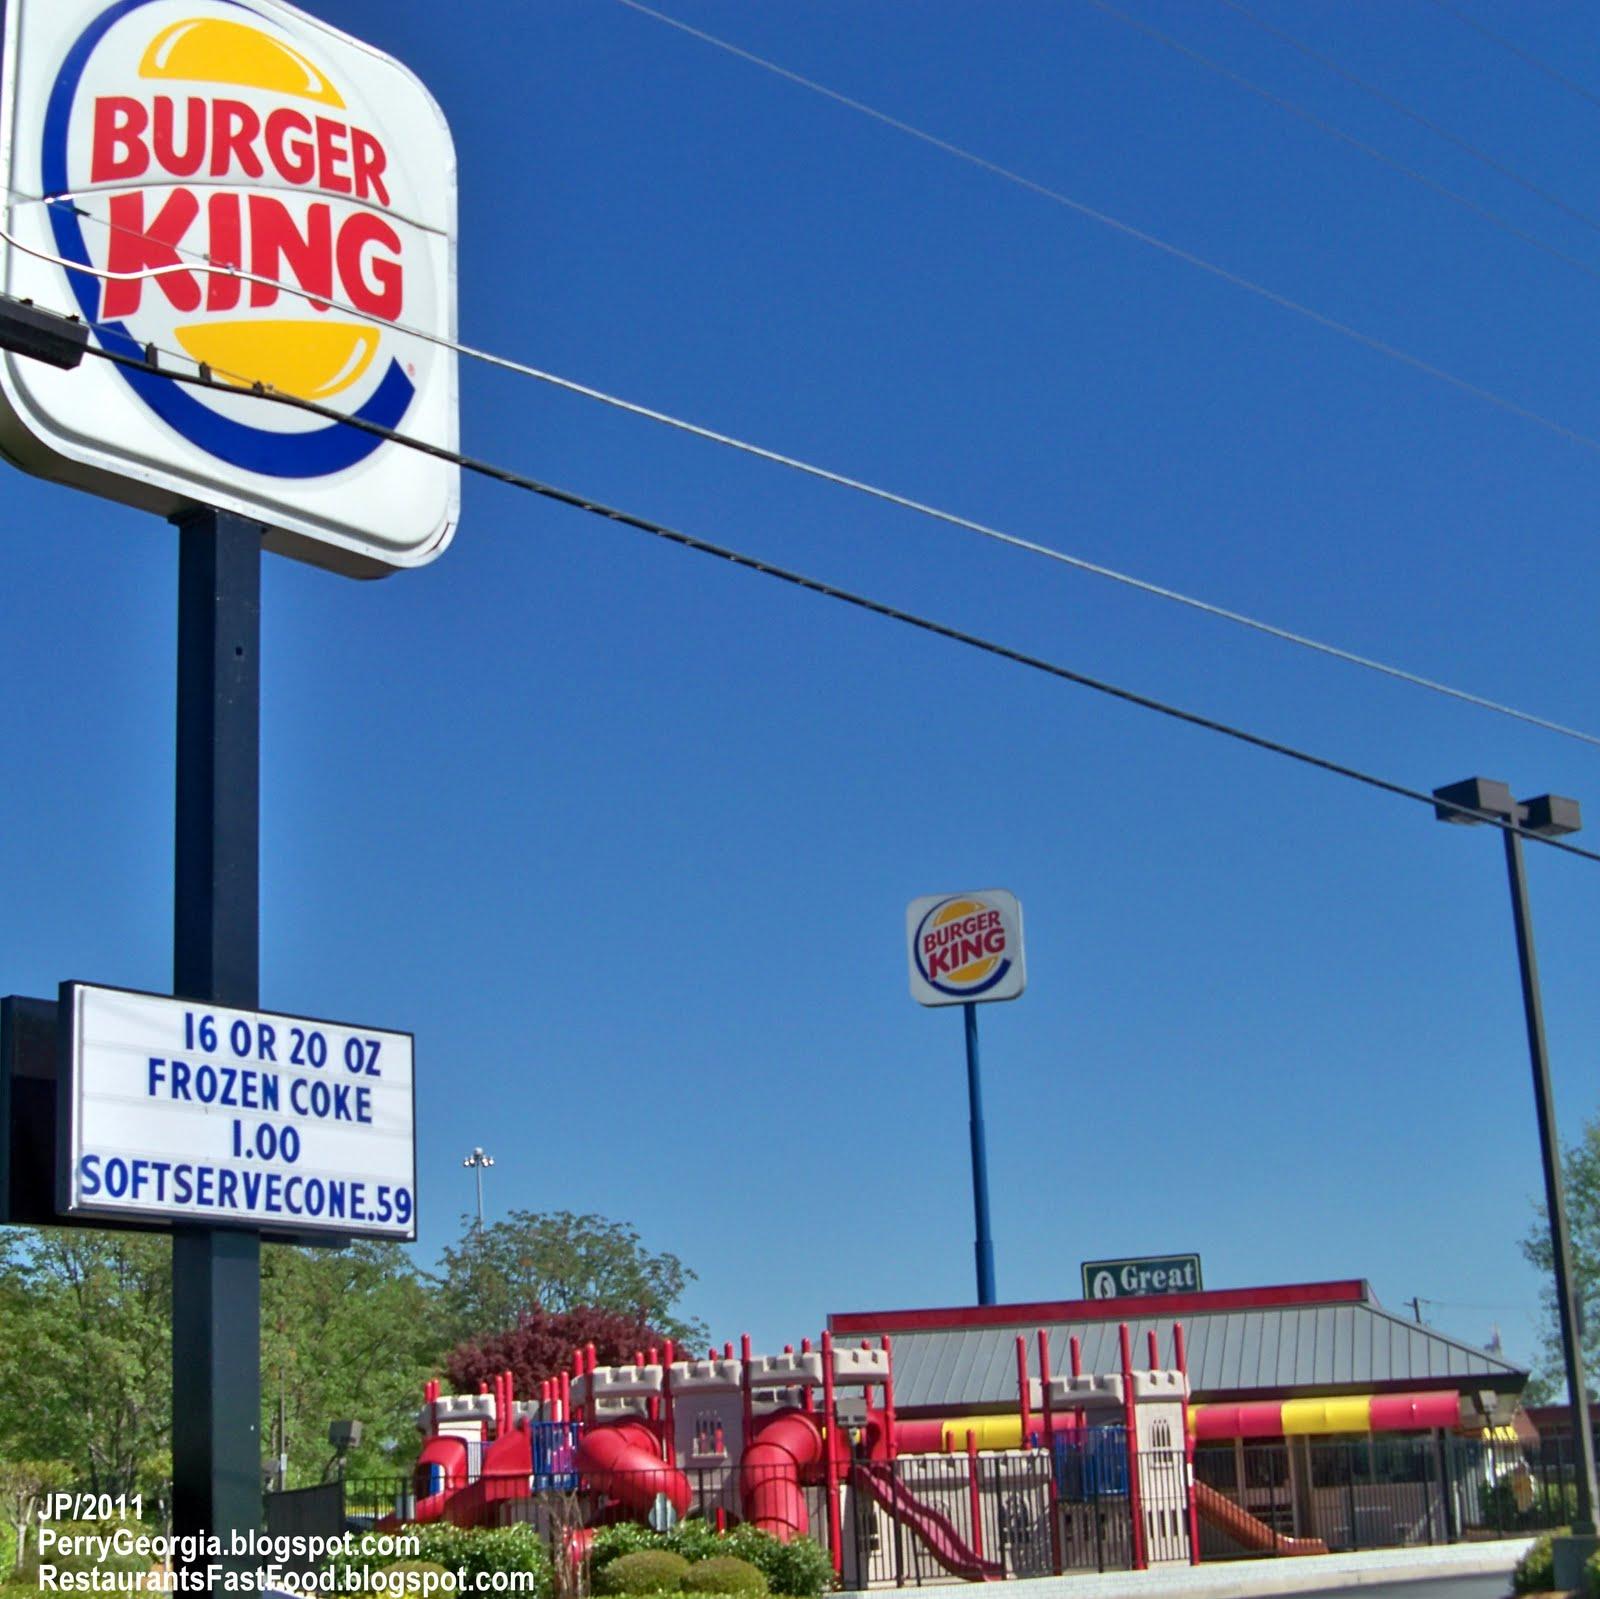 Restaurant Fast Food Menu McDonald's DQ BK Hamburger Pizza Mexican Taco BBQ Chicken Seafood ...